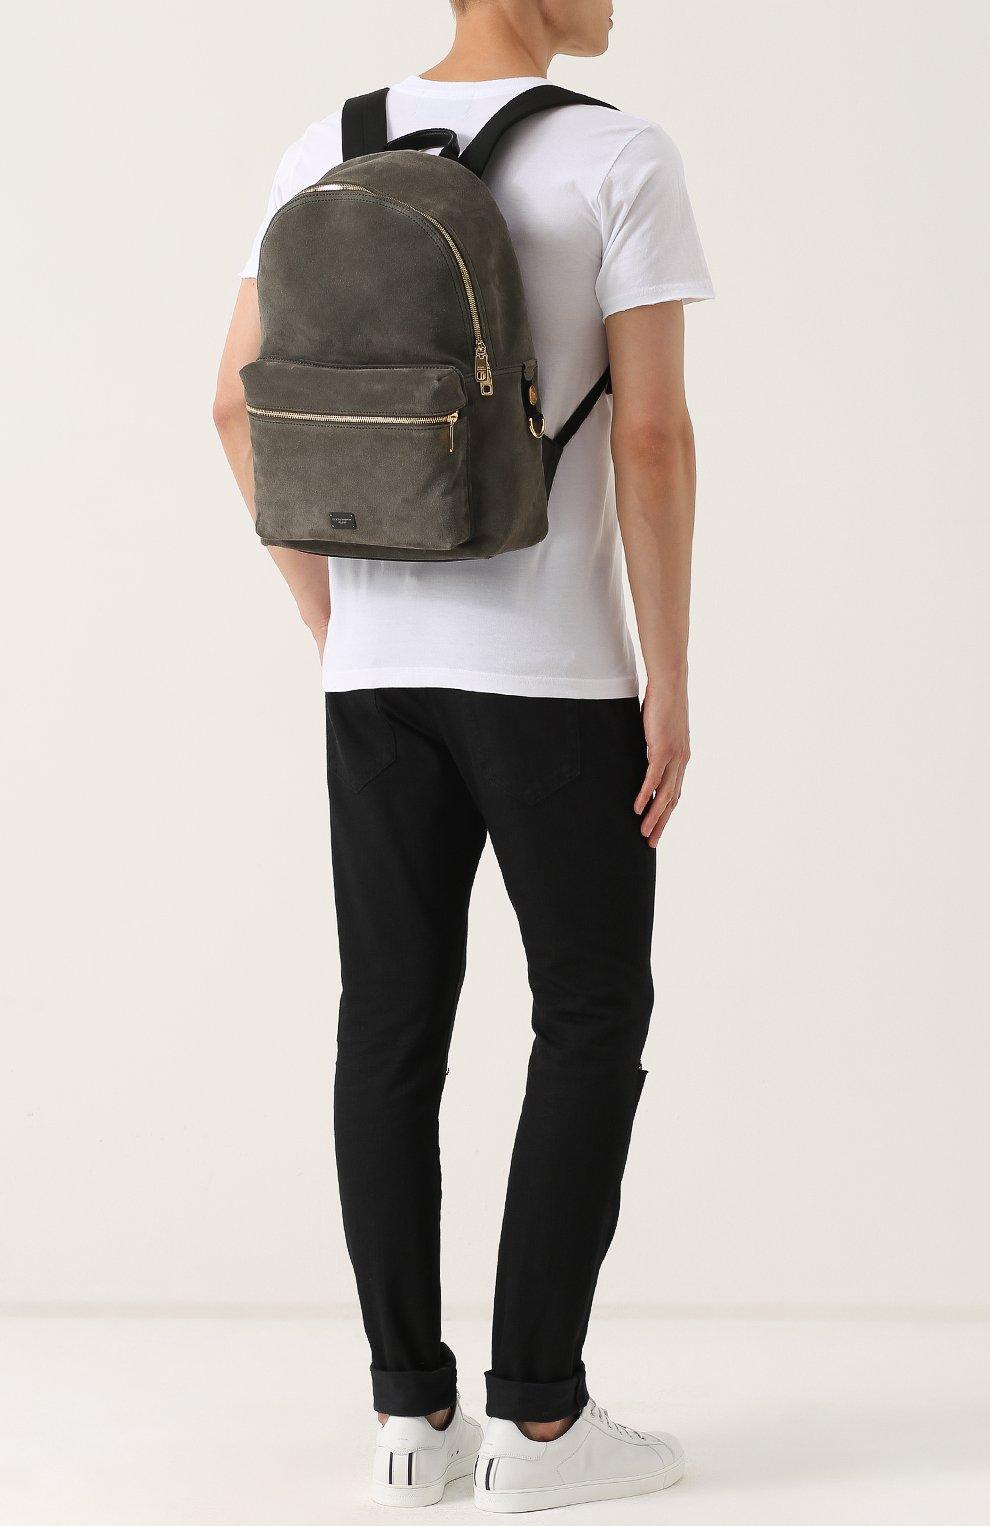 Замшевый рюкзак с внешним карманом на молнии Dolce & Gabbana хаки | Фото №2